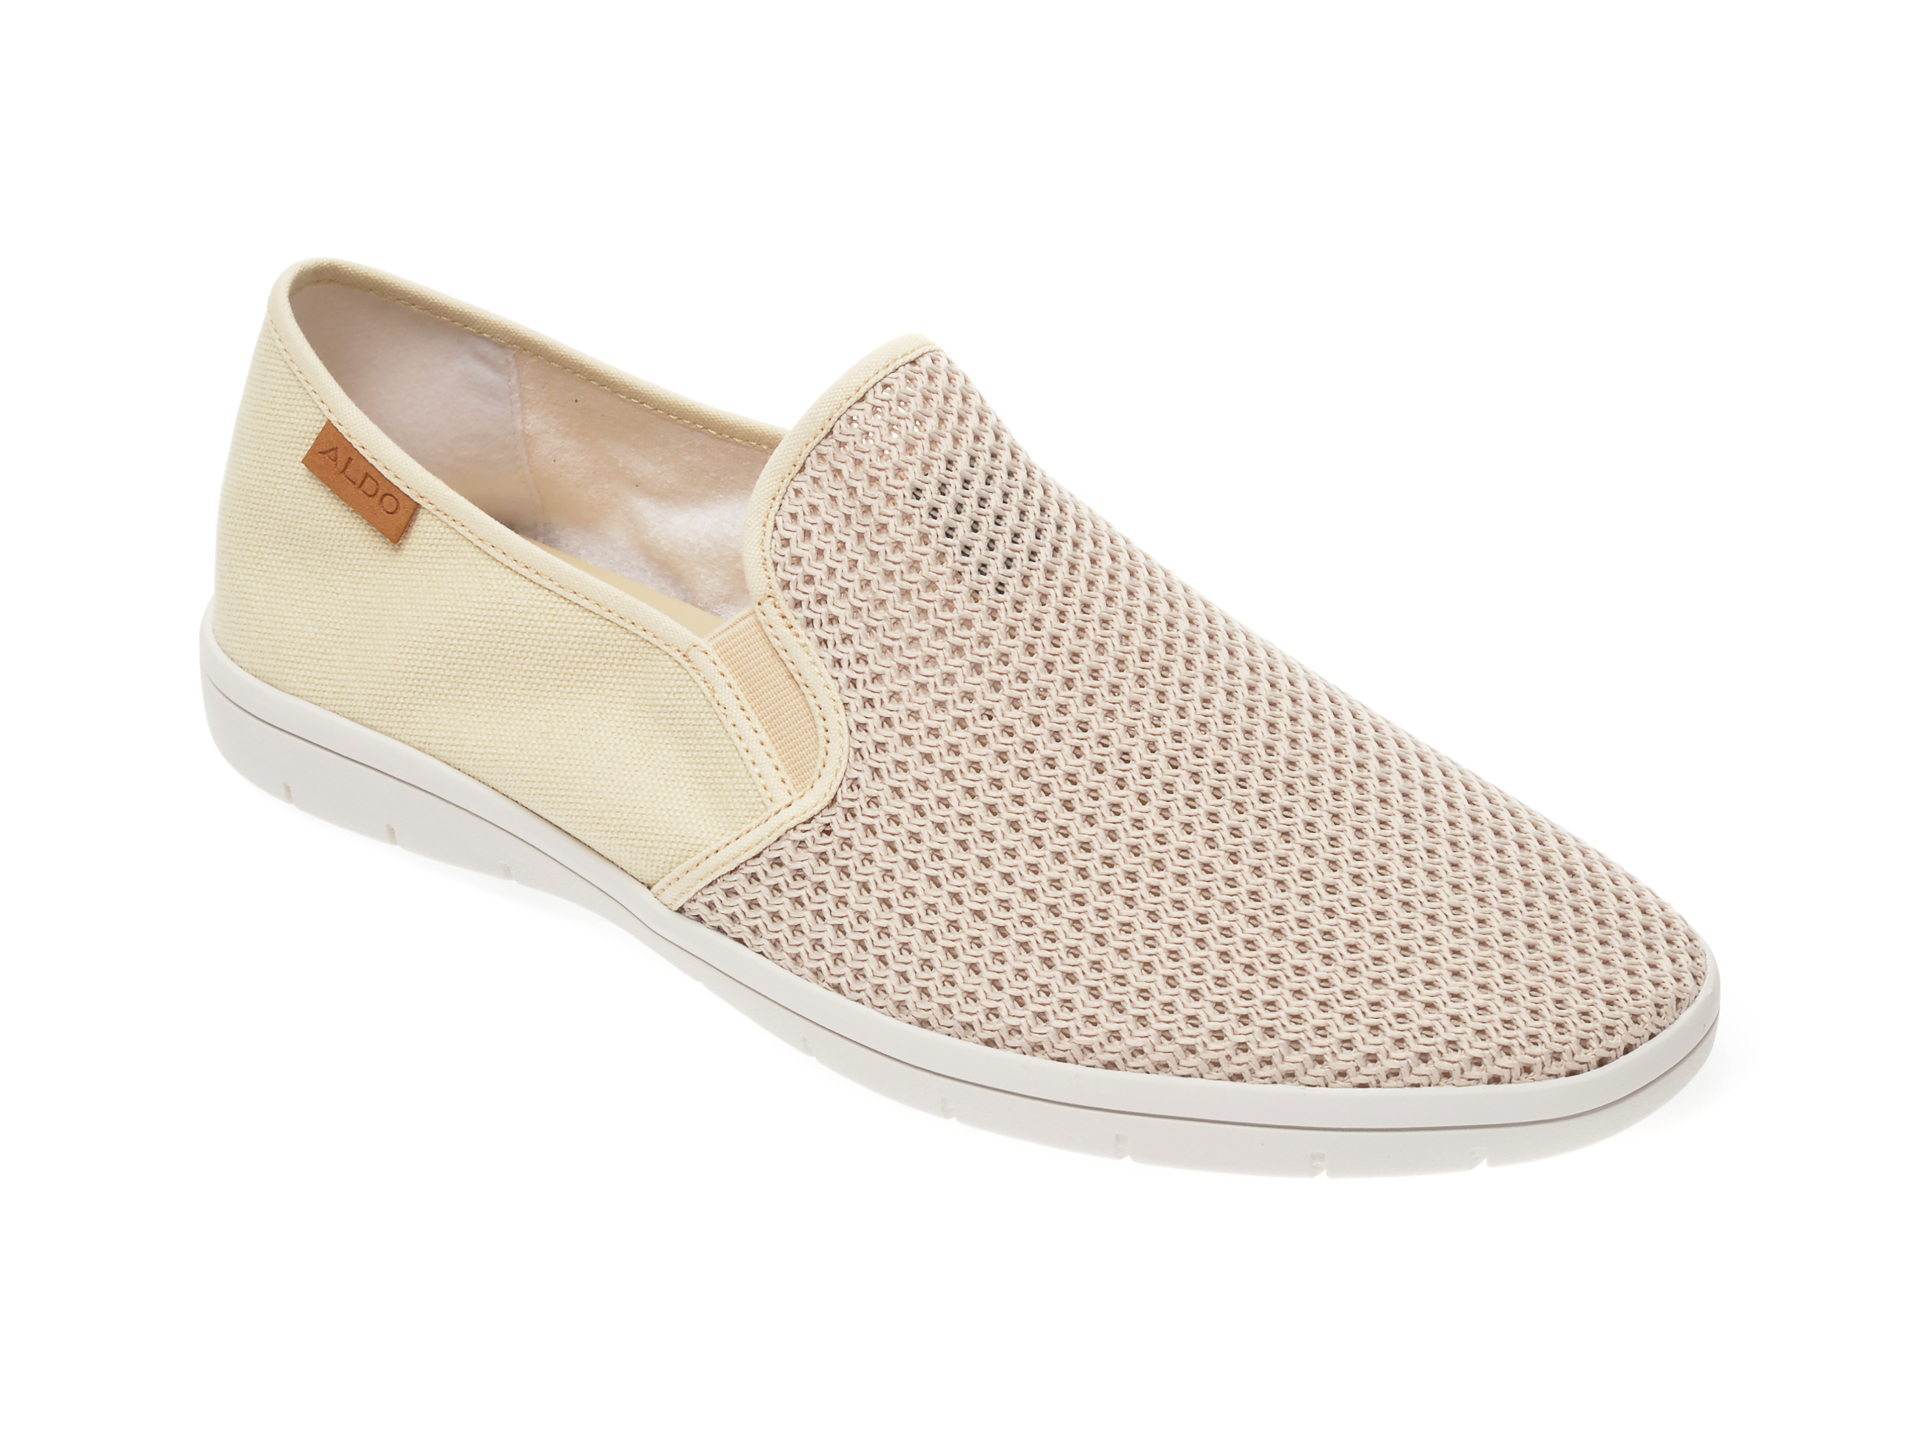 Pantofi ALDO bej, Liberace271, din material textil imagine